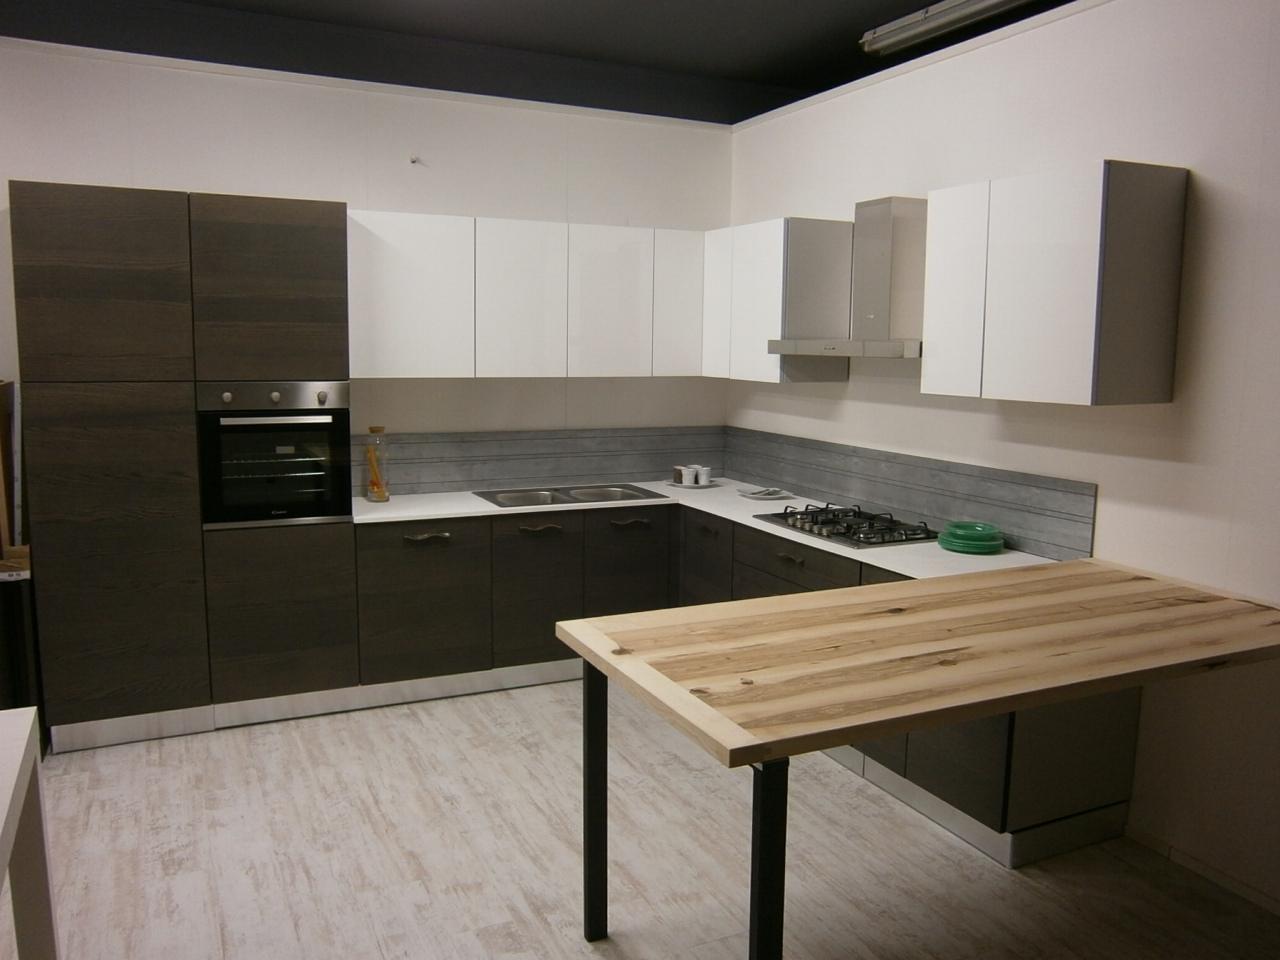 Arrex 2 cucina corallo moderne legno cucine a prezzi - Prezzi cucine moderne ...